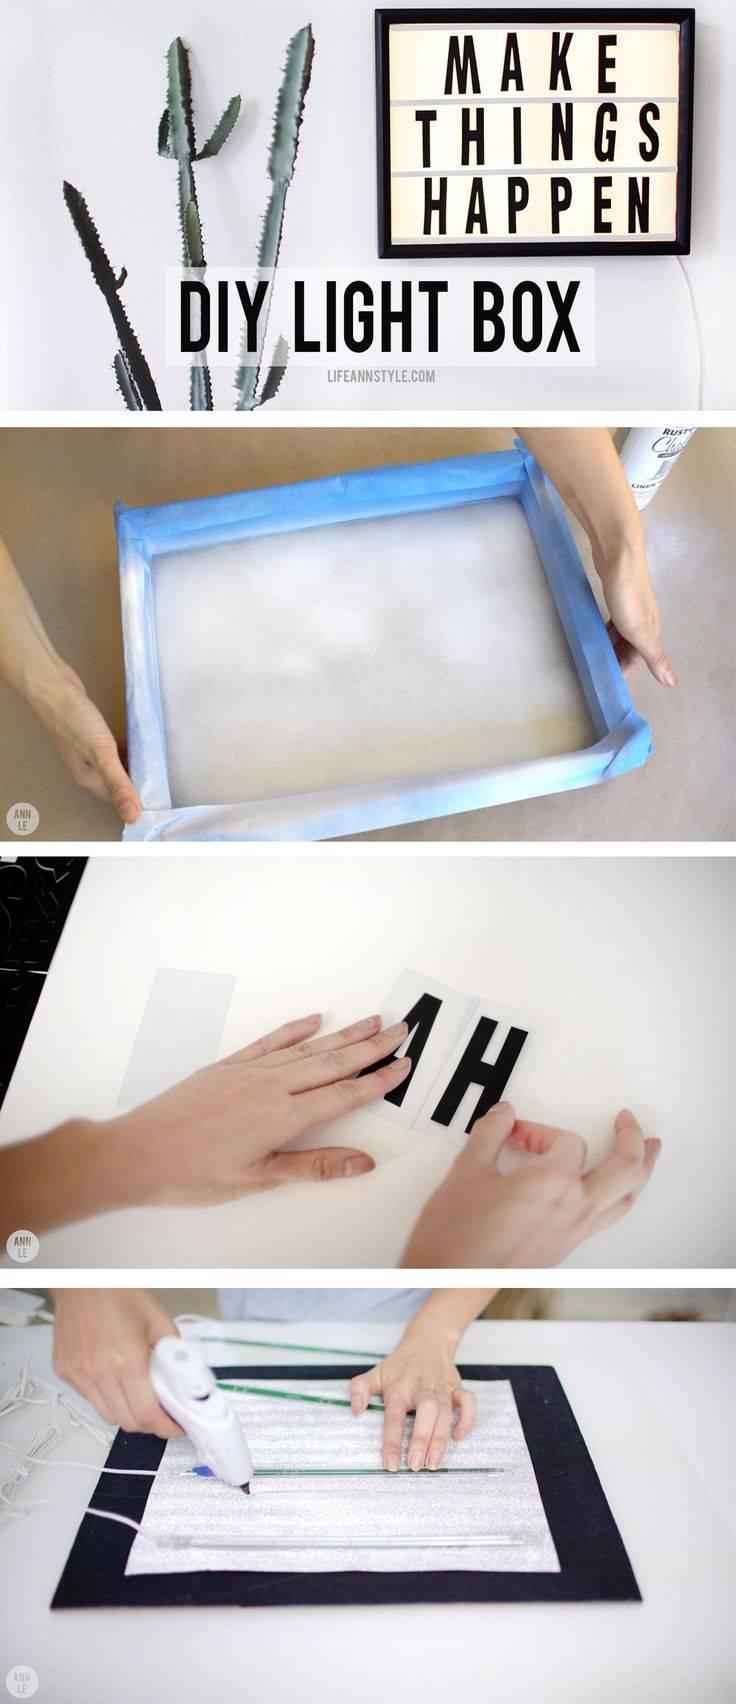 Top 25+ Best Diy Light Box Ideas On Pinterest | Photo Light Box inside Lights In The Box Lighting (Image 12 of 12)